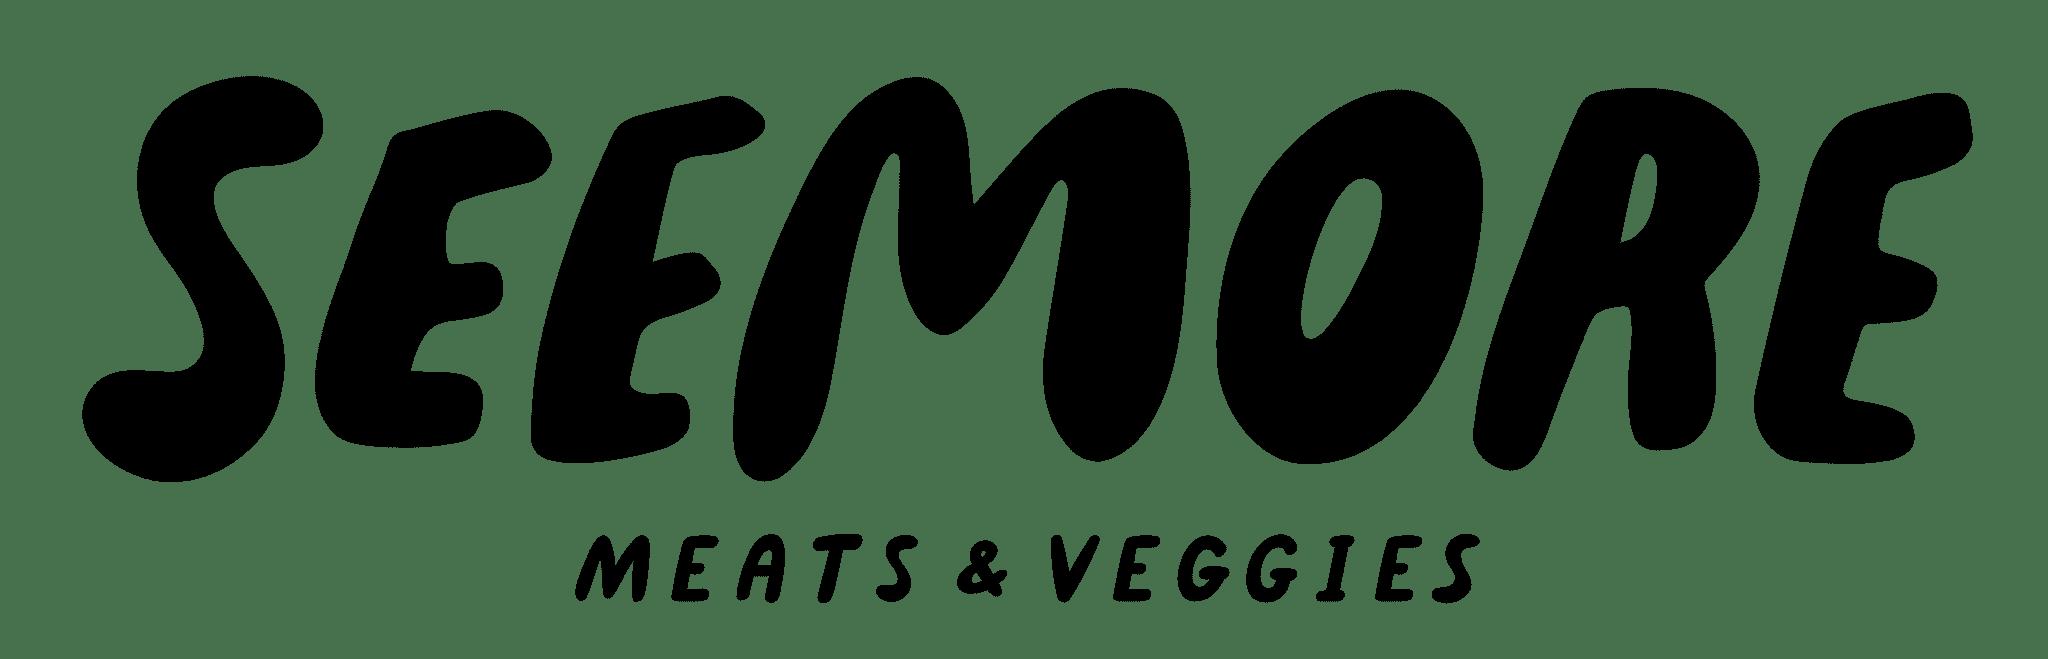 Seemore Meats & Veggies Logo